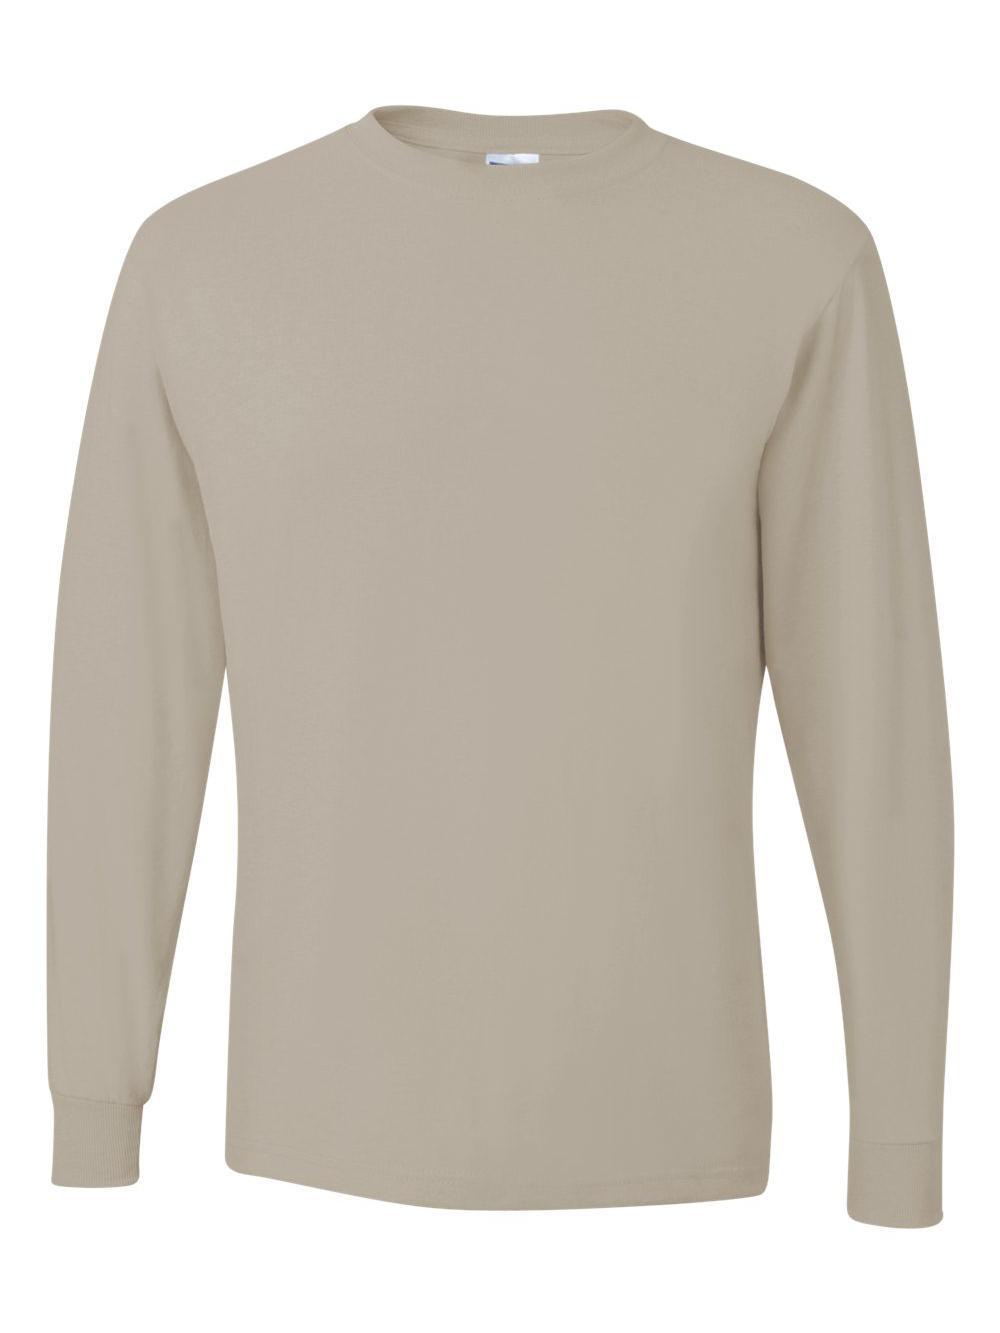 Jerzees-Dri-Power-Long-Sleeve-50-50-T-Shirt-29LSR thumbnail 78